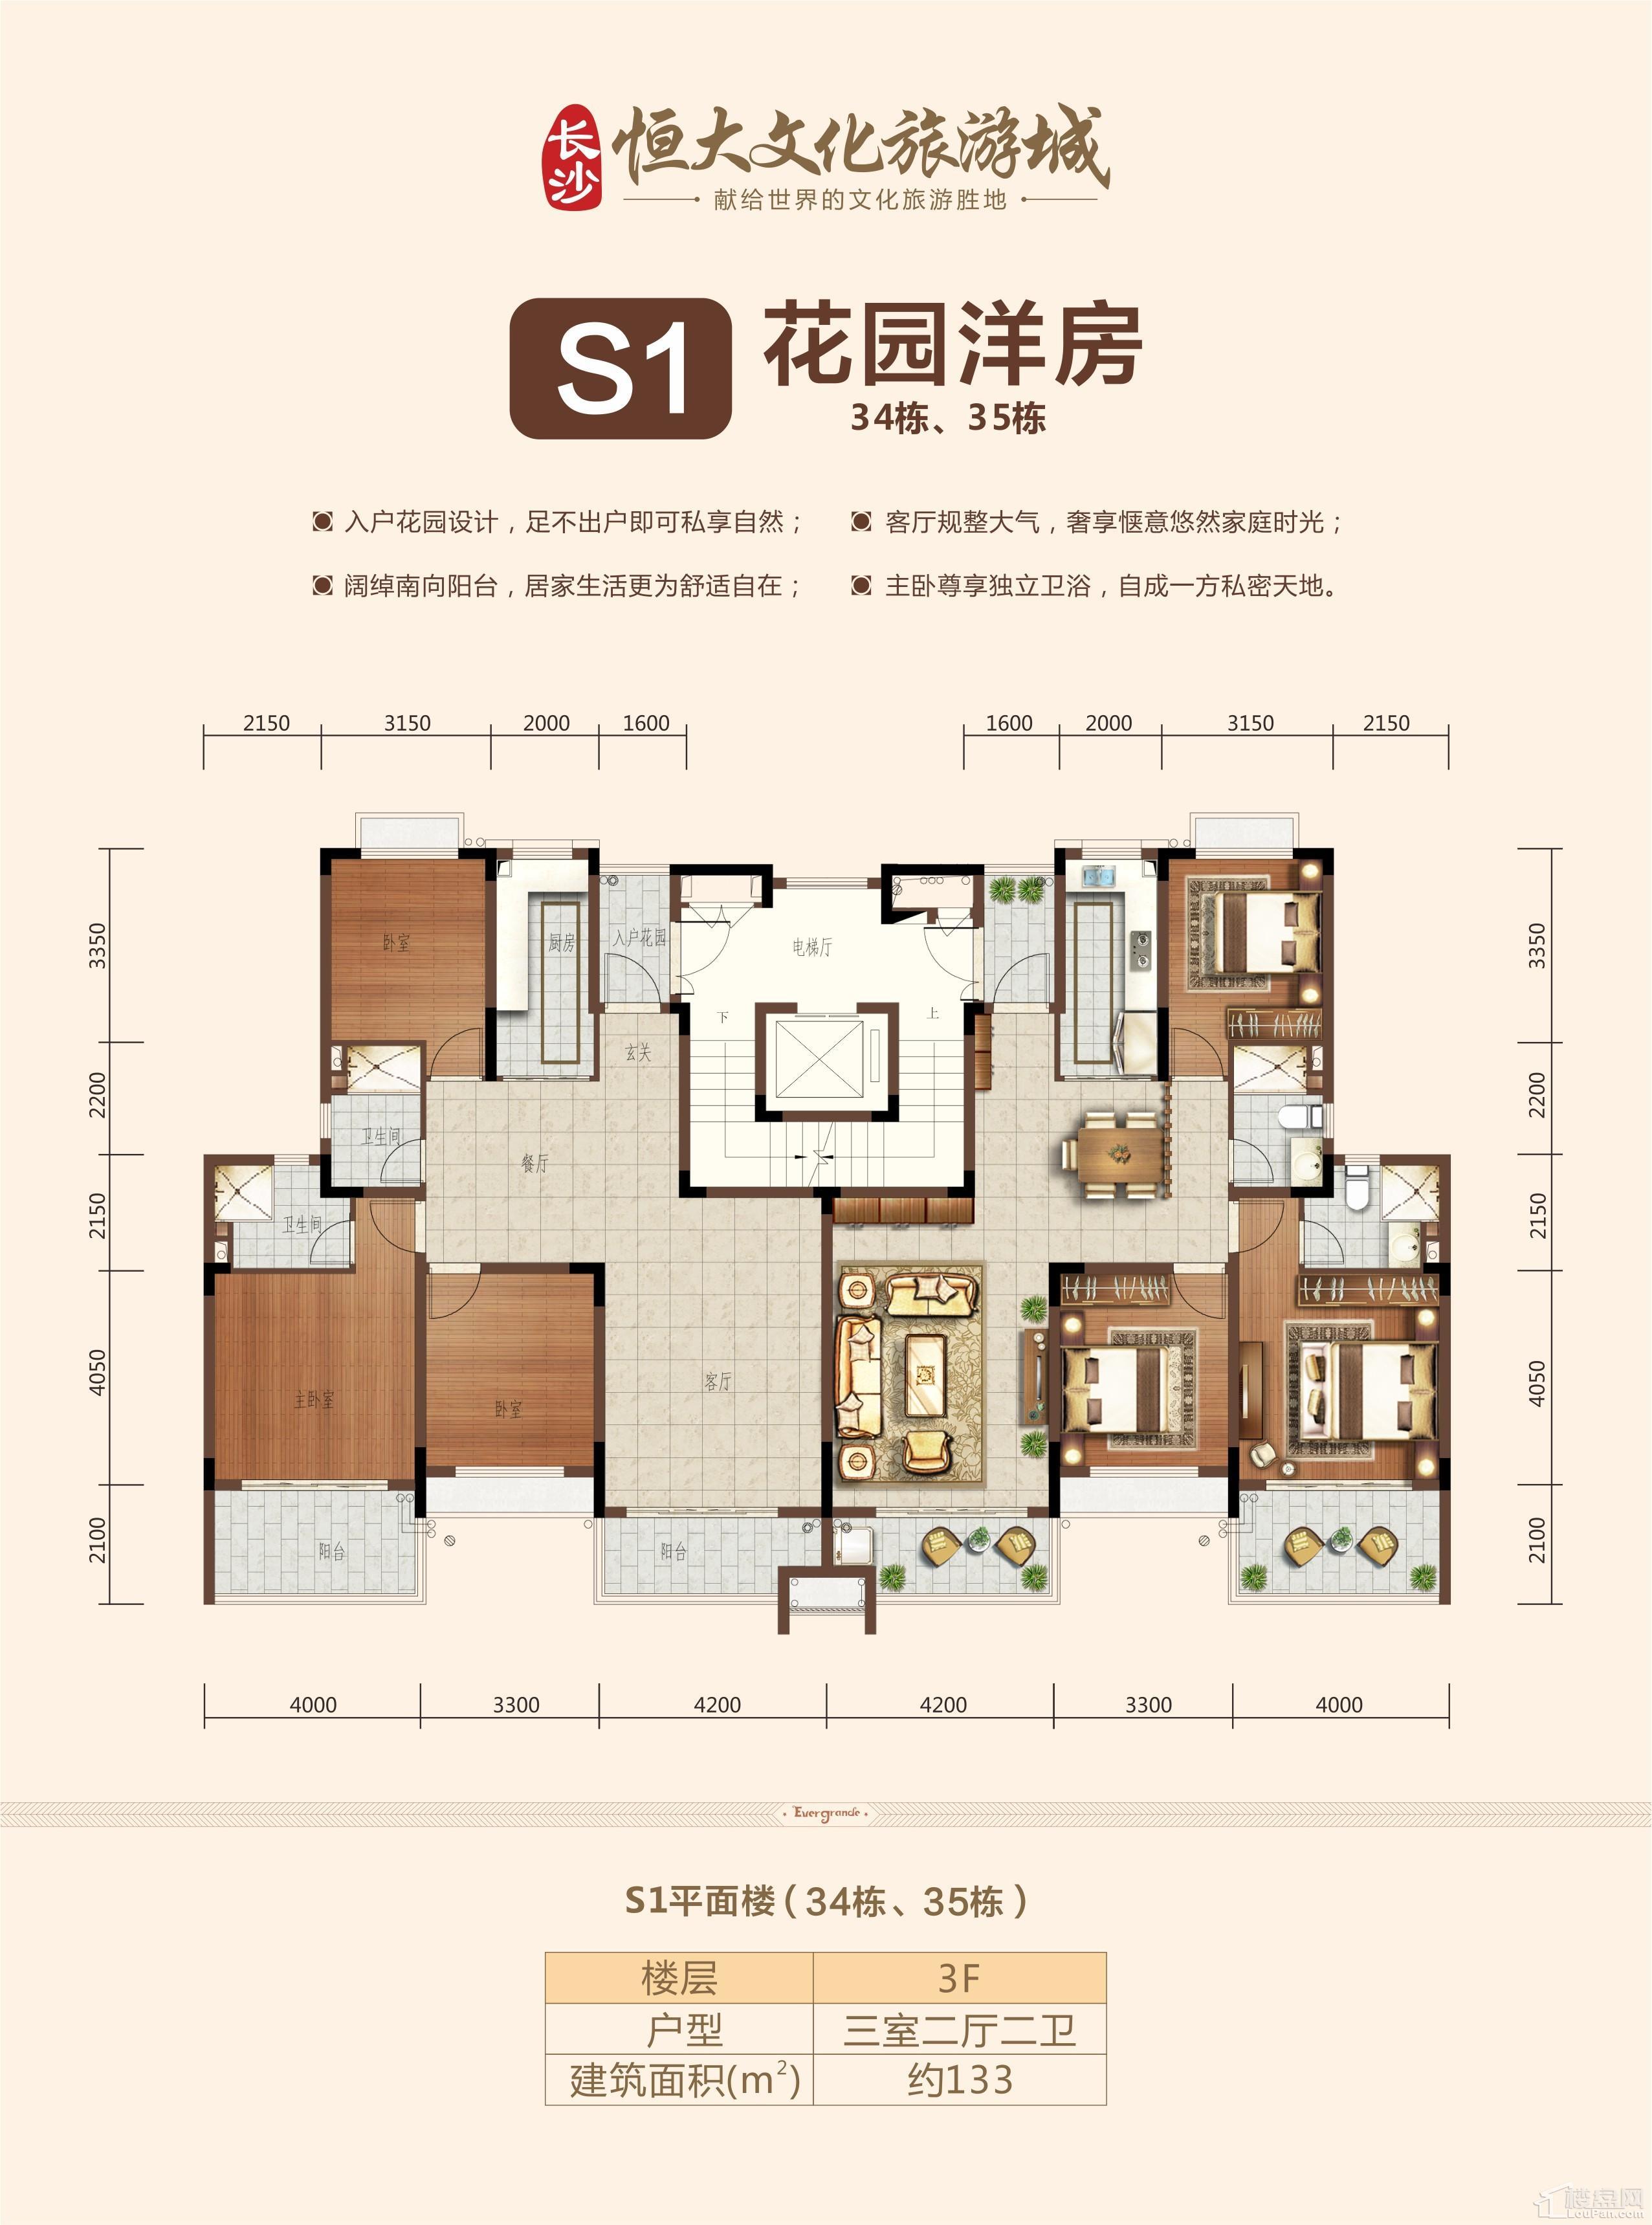 S1花园洋房三层